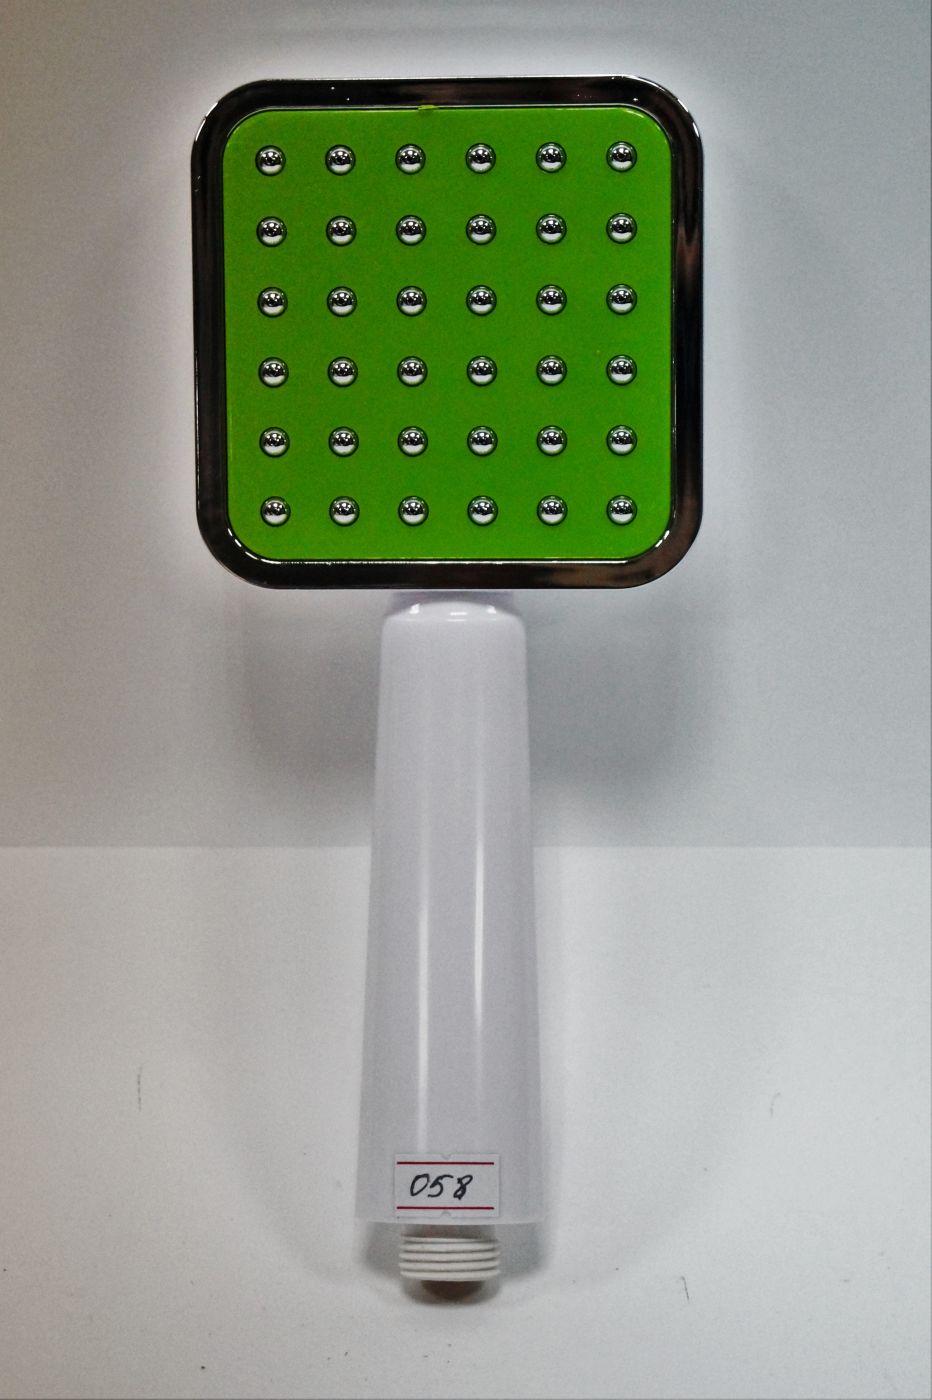 АА-058, Бело - зеленая цветная лейка Vaserzberg